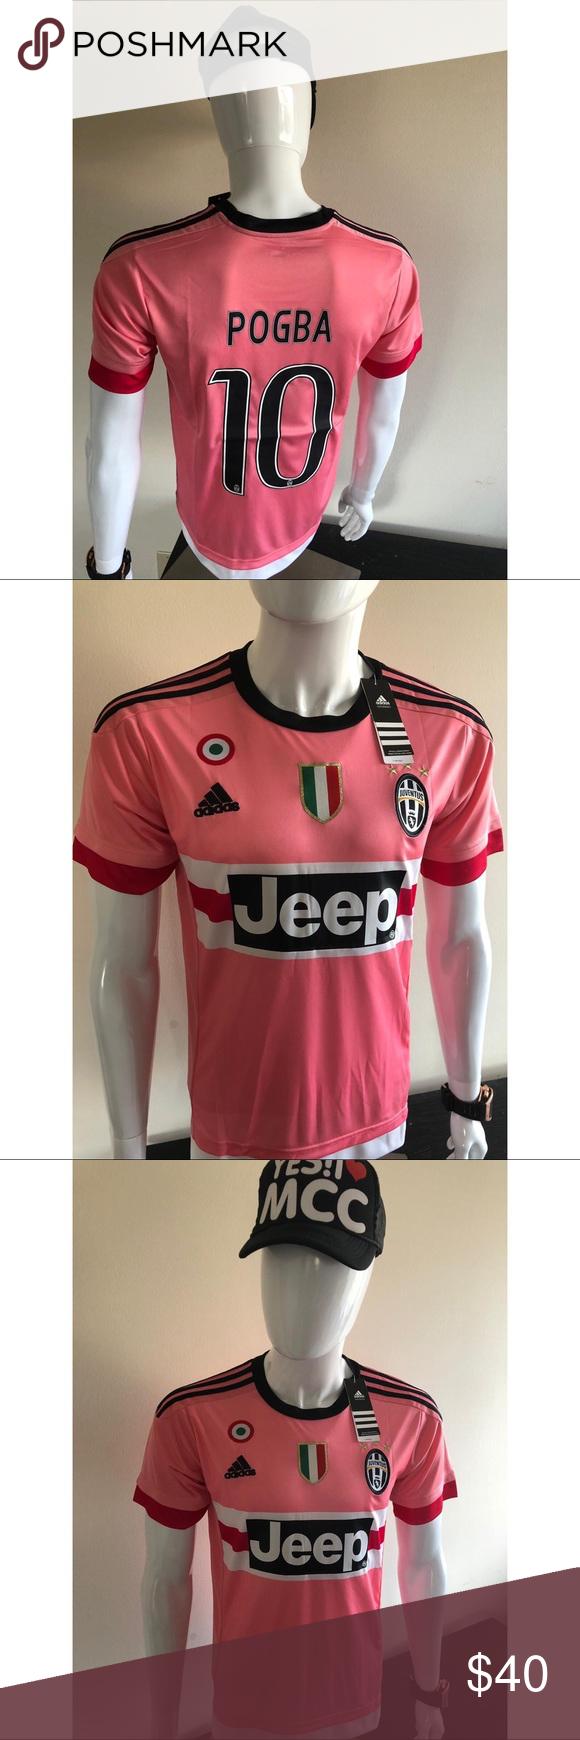 reputable site 14f71 f5e70 Pogba Pink Juventus Brand new juventus Jersey Pogba #10 ...